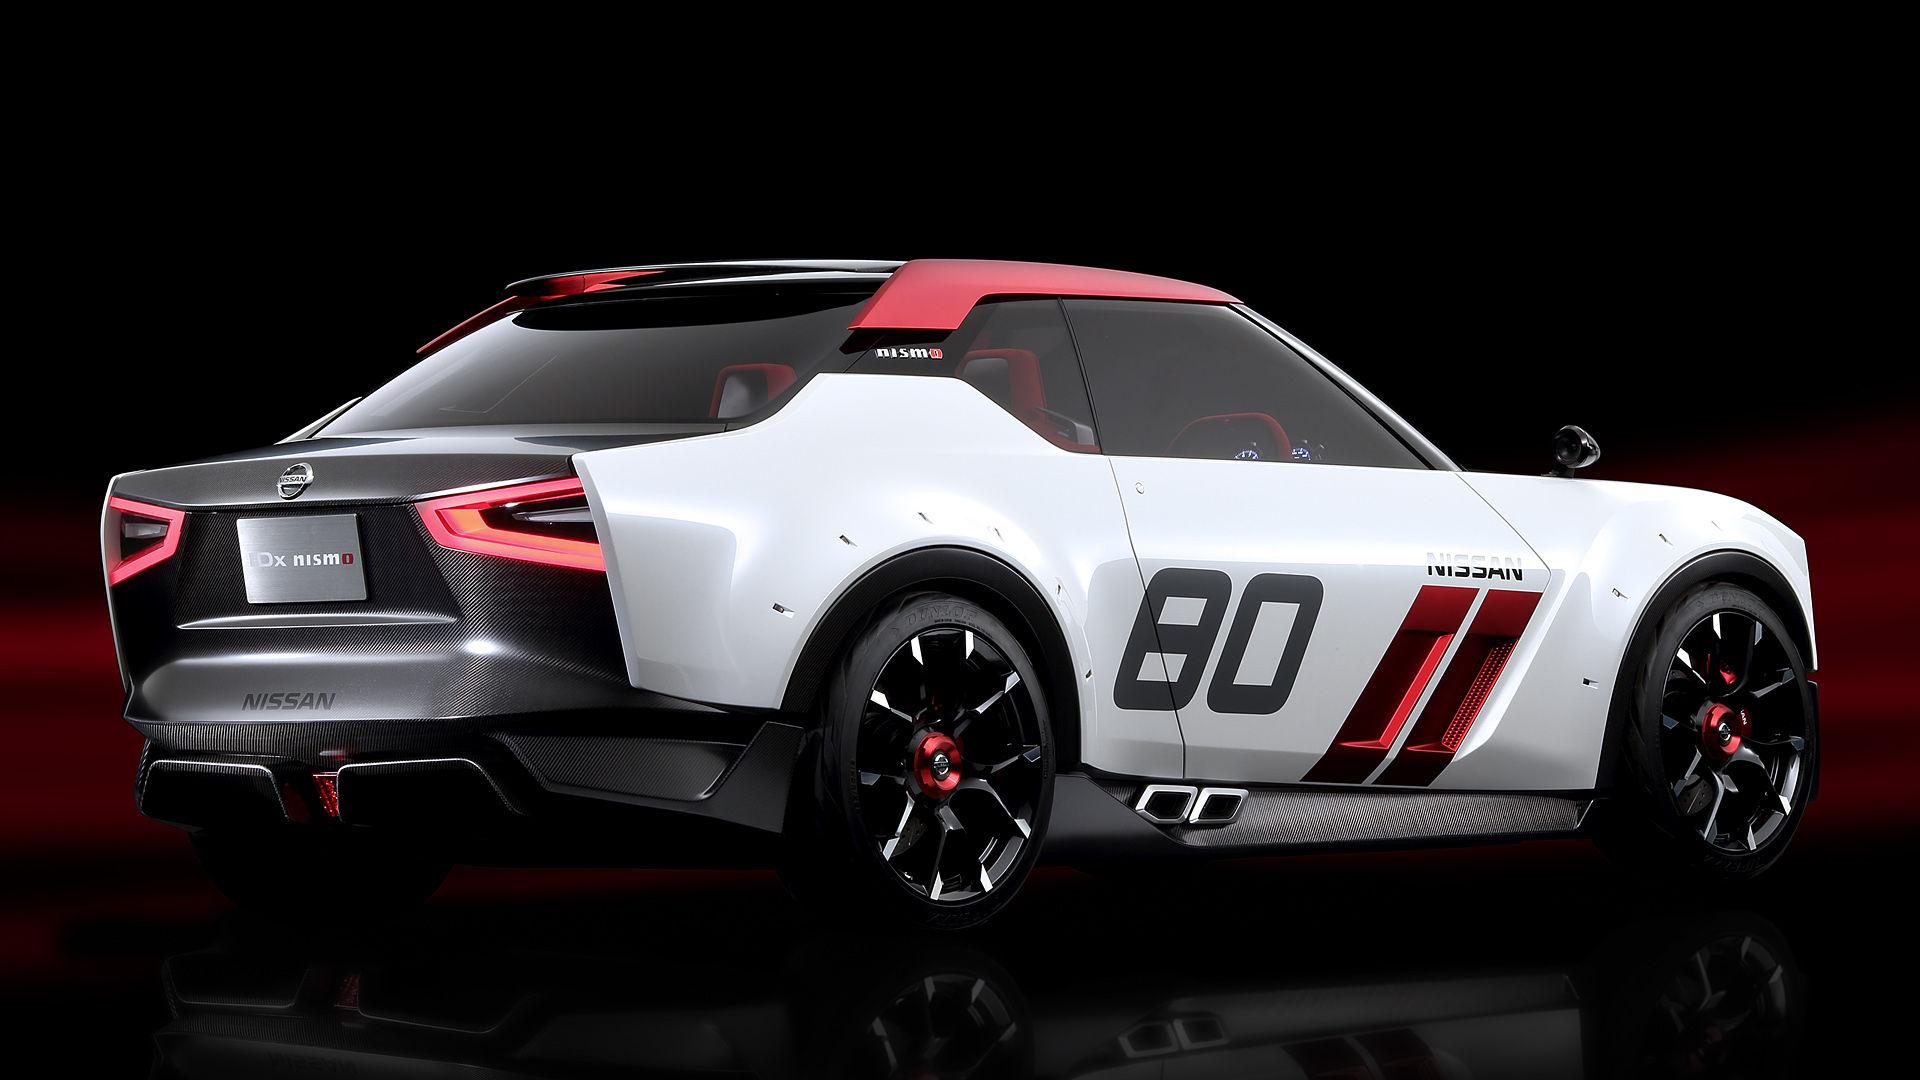 2013 Nissan IDx Nismo Concept